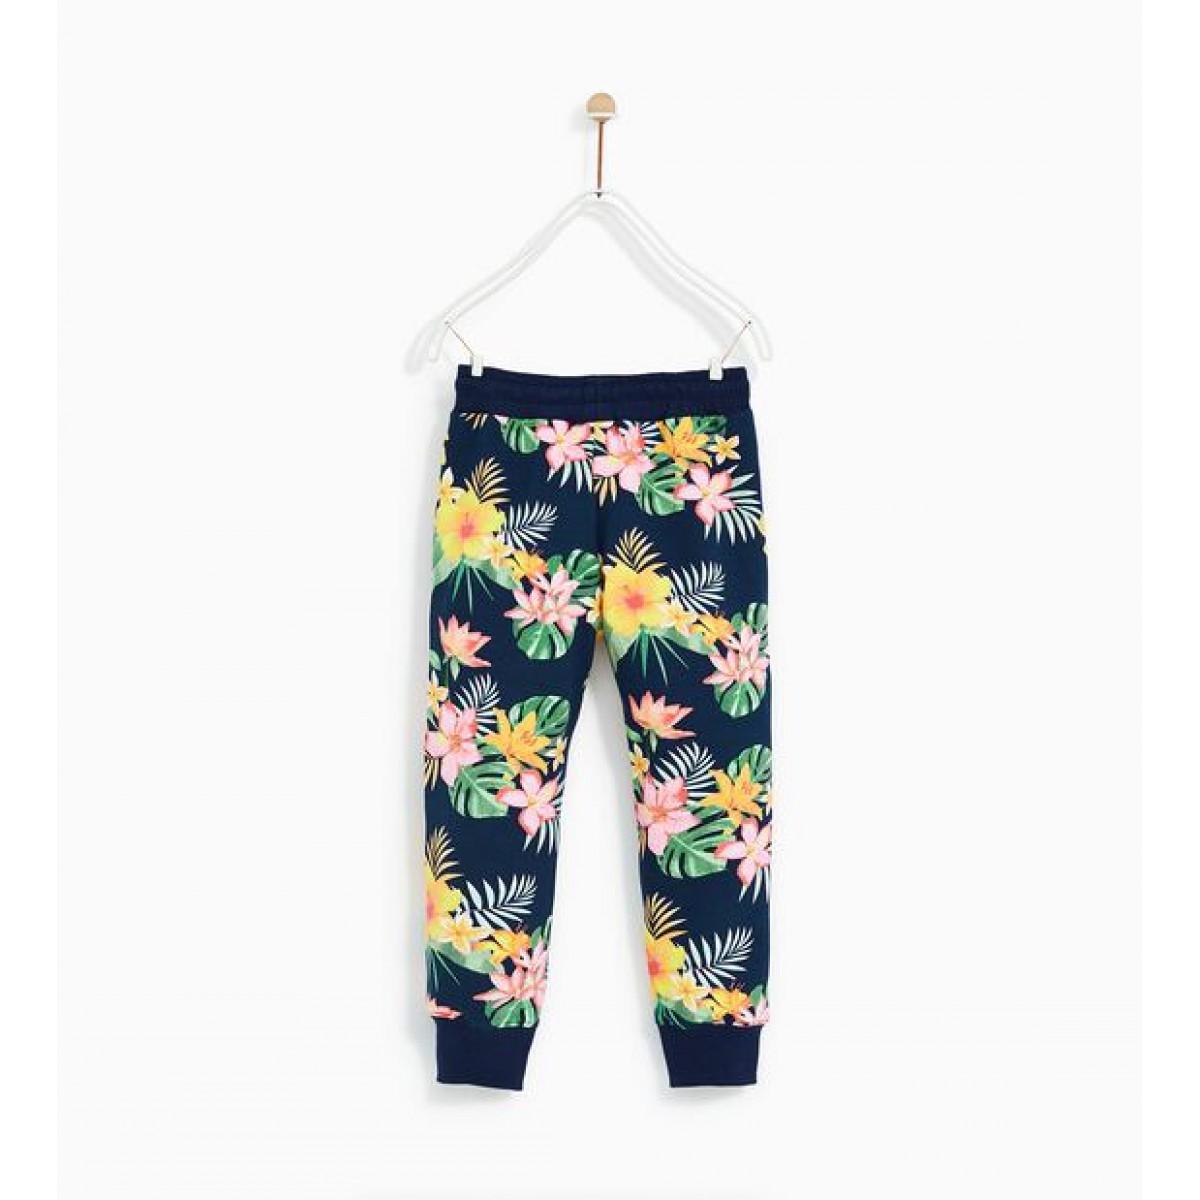 Zara Plush Jersey Tropical Trousers